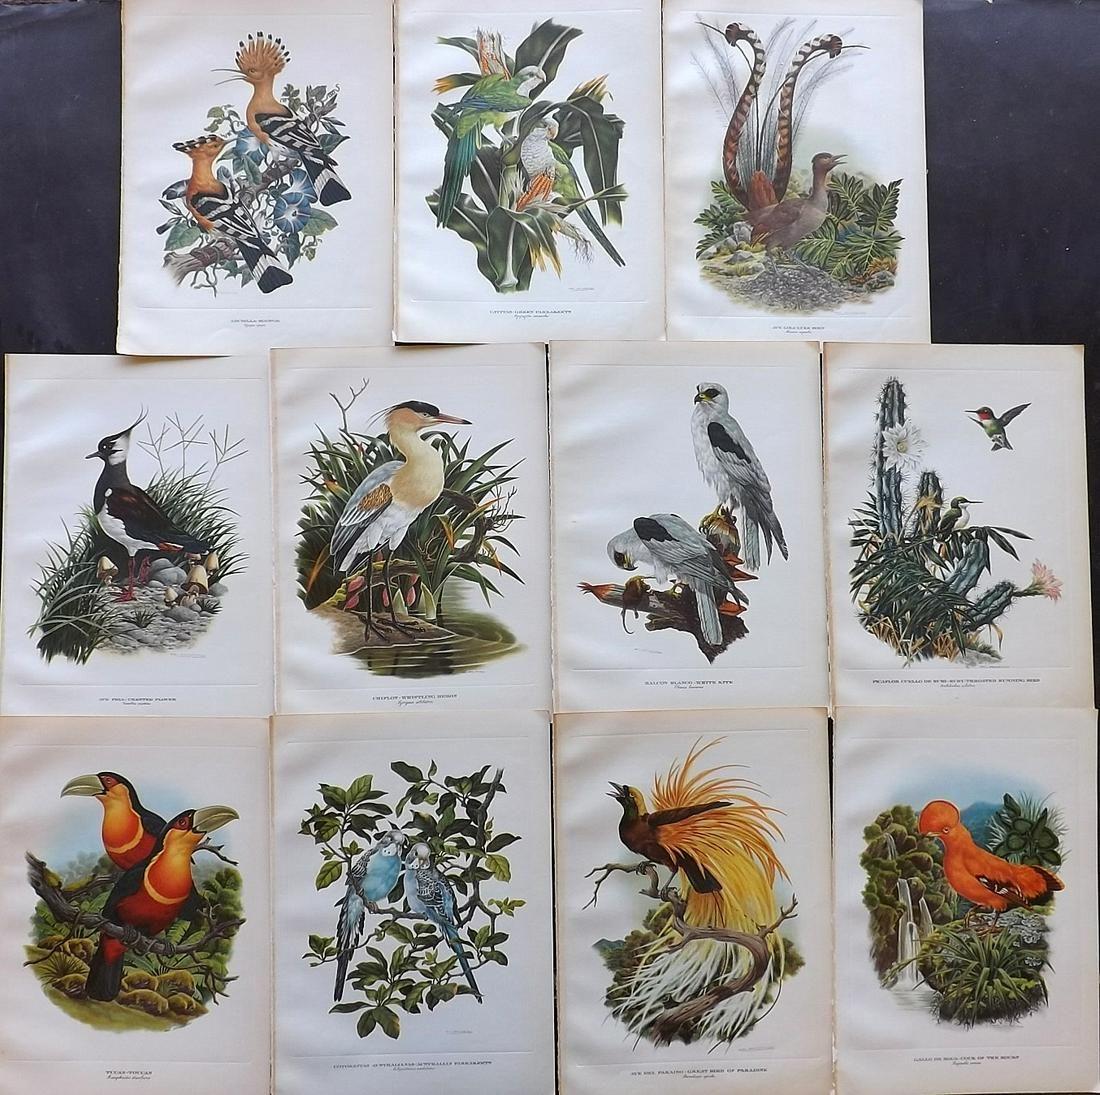 Clark & Amuchastegui 1952 Lot of 11 Bird Prints